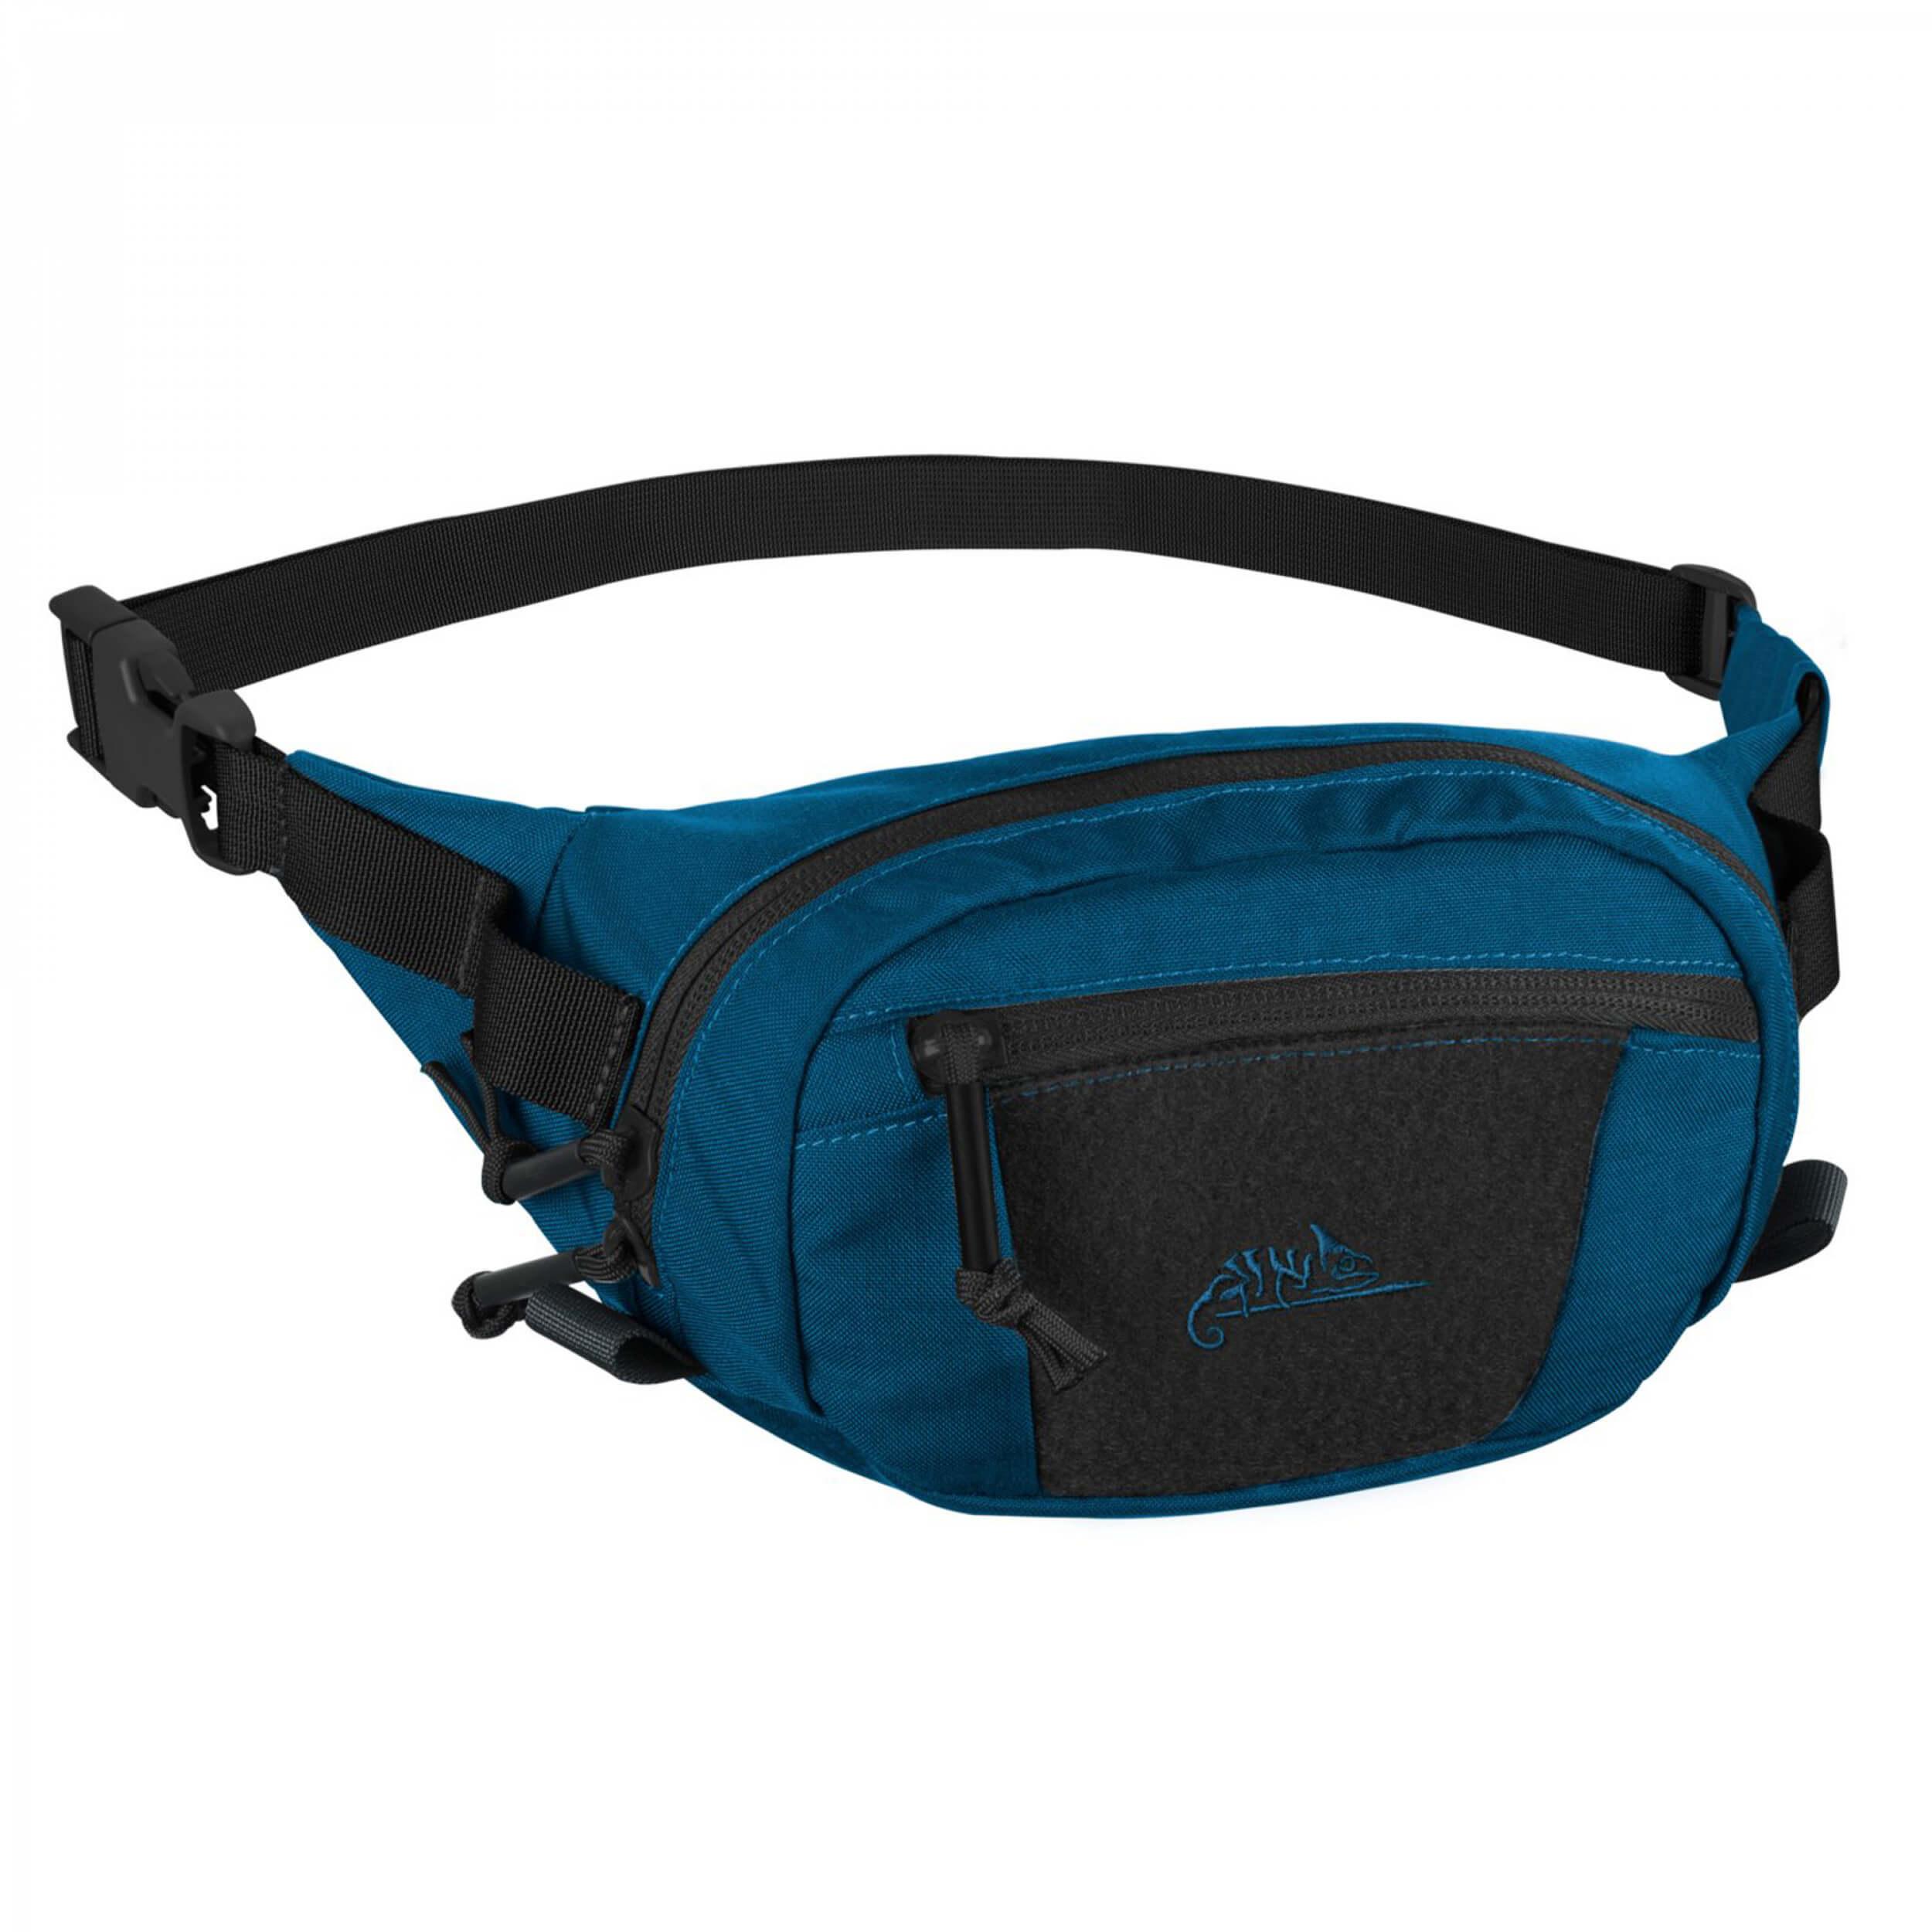 Helikon-Tex Possum Waist Pack - Cordura Midnight Blue / Black C